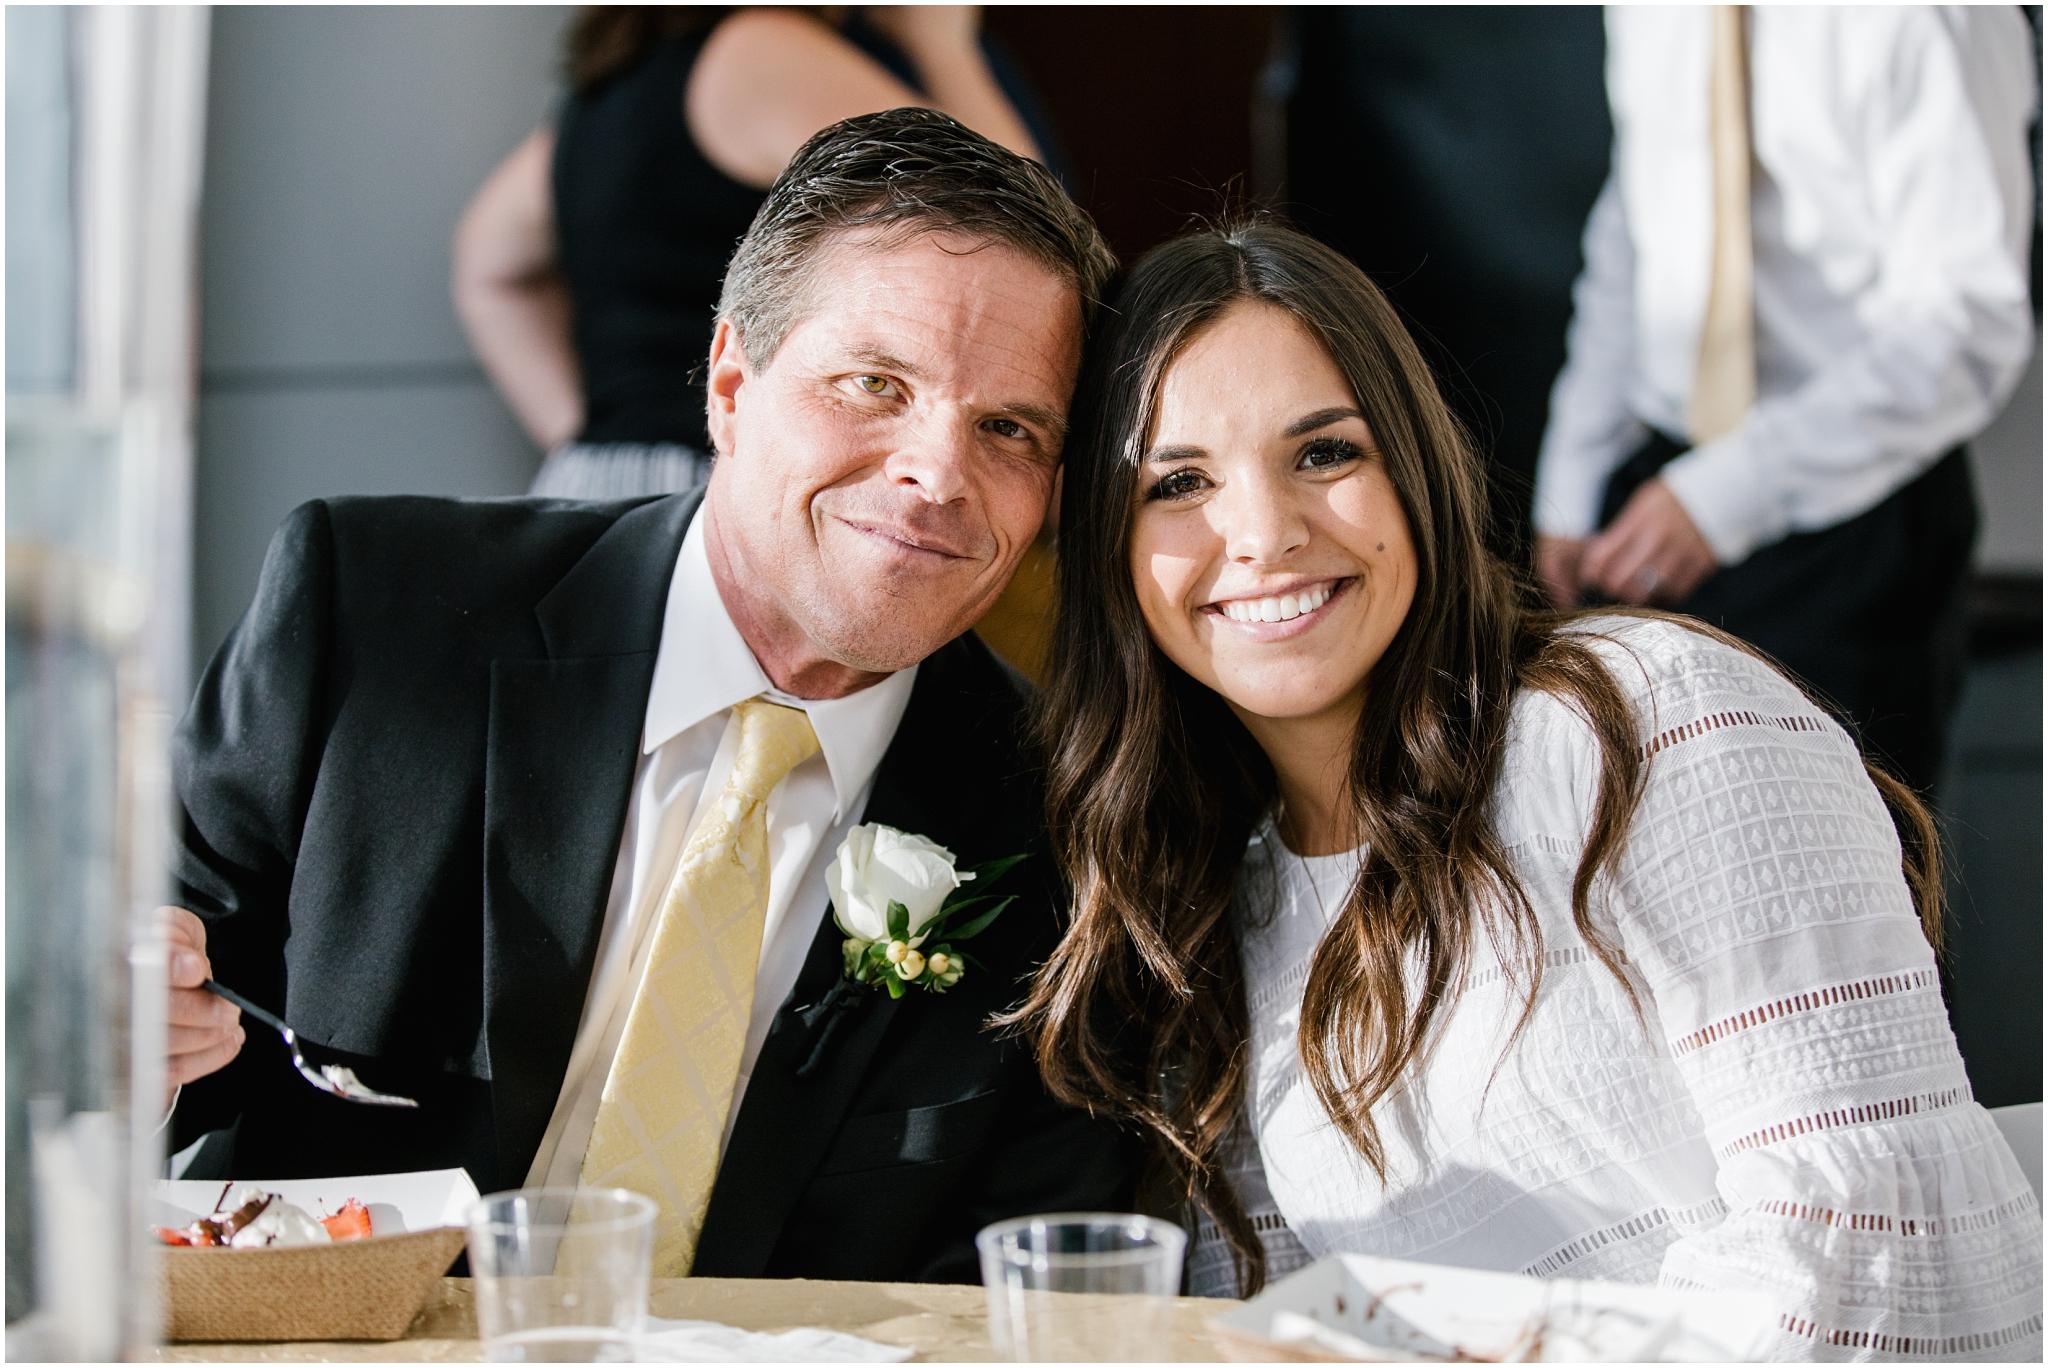 CherylandTyler-466_Lizzie-B-Imagery-Utah-Wedding-Photographer-Salt-Lake-City-Temple-Wells-Fargo-Building-Reception.jpg